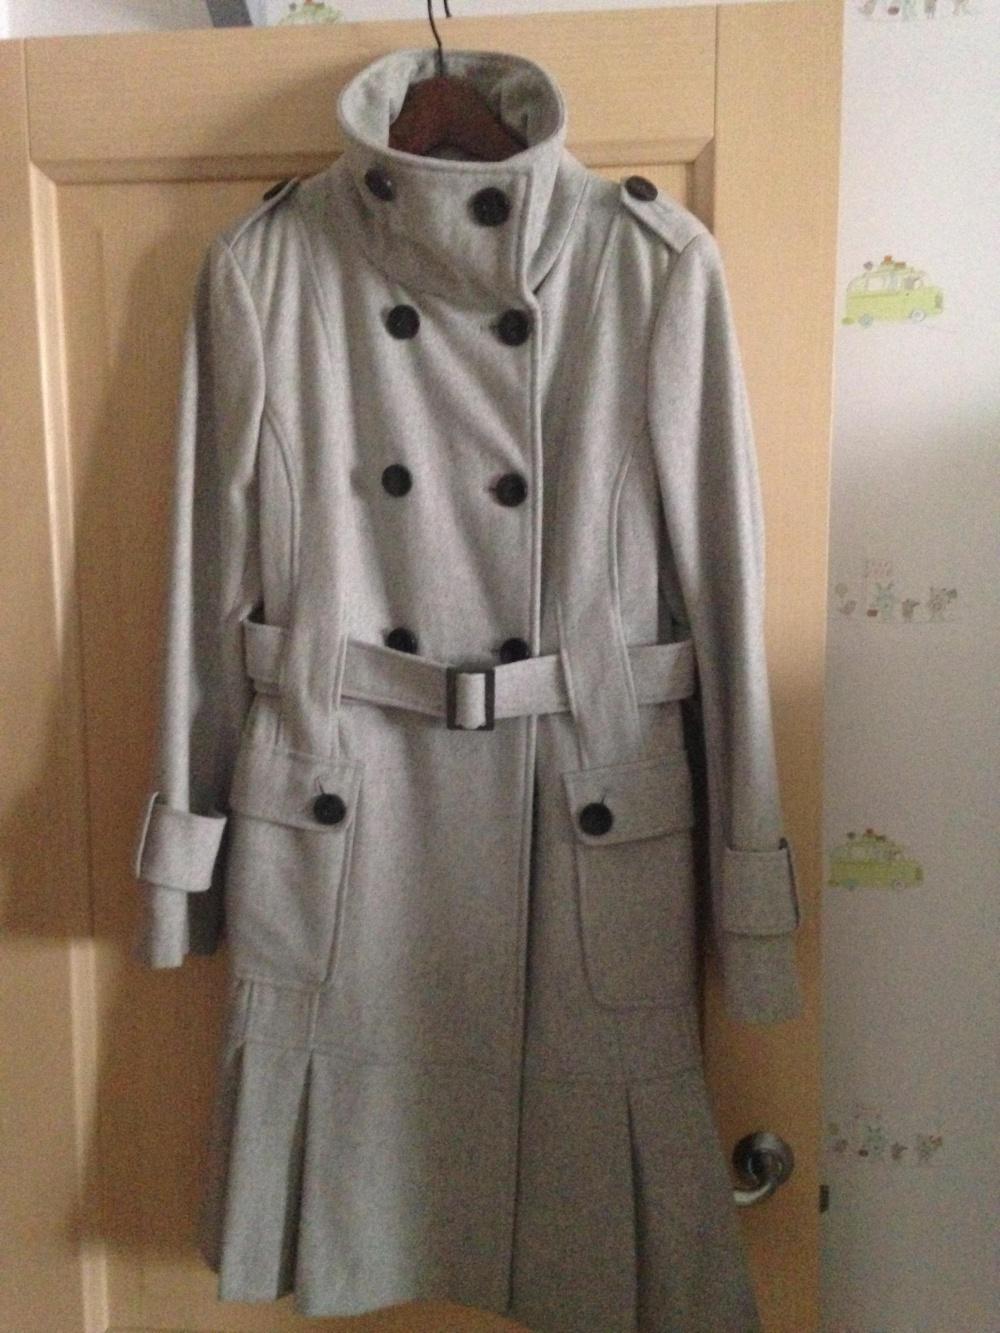 b313cec3bc71 Пальто Calvin Klein женское шерстяное, размер 42-44, в магазине Gilt ...